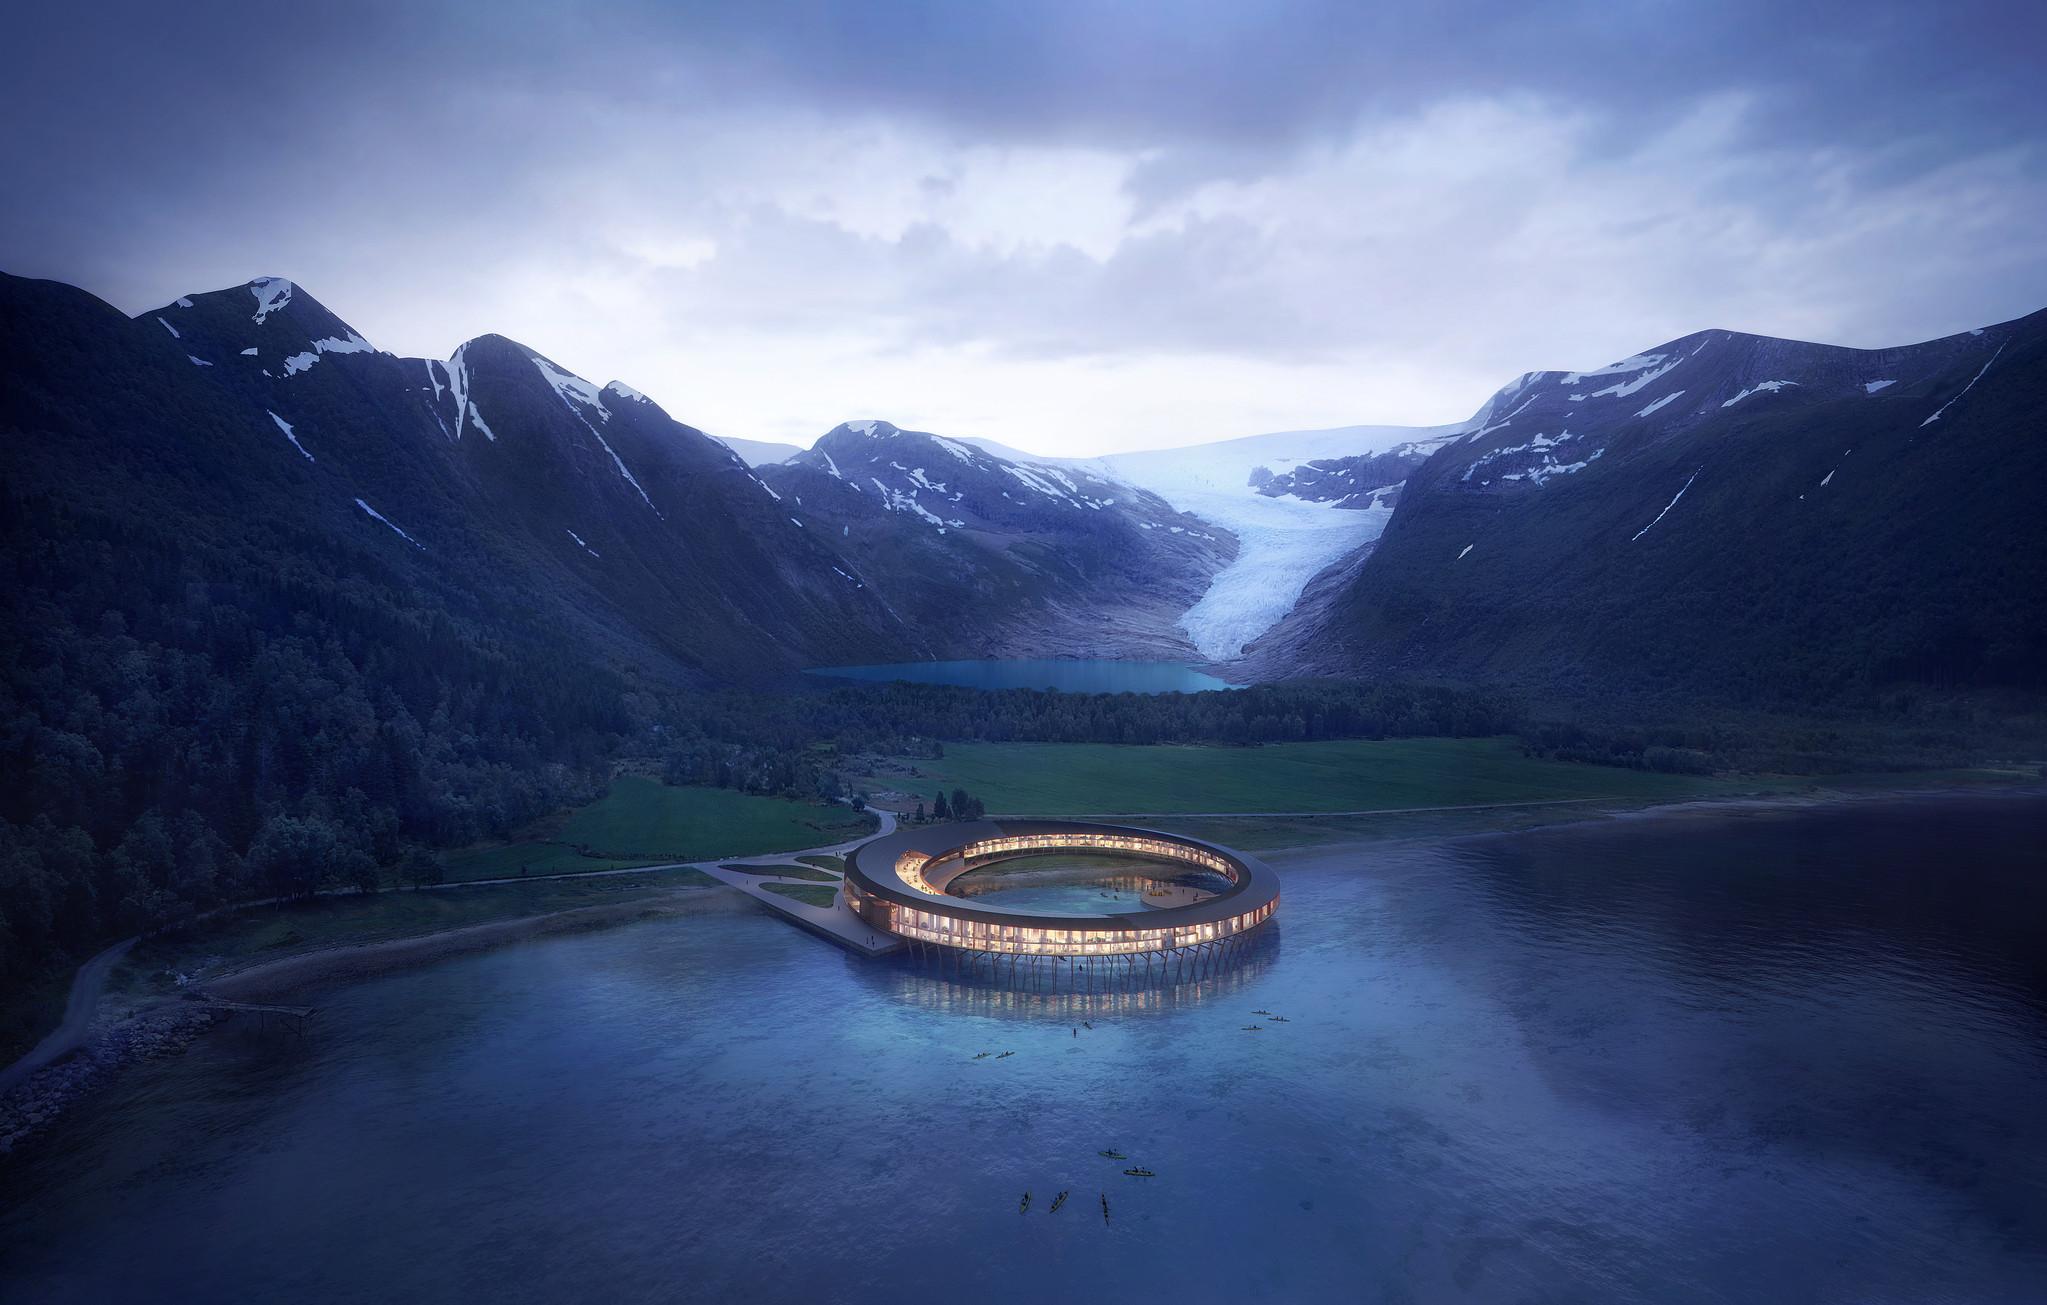 Svart hotel, Norway by Snøhetta